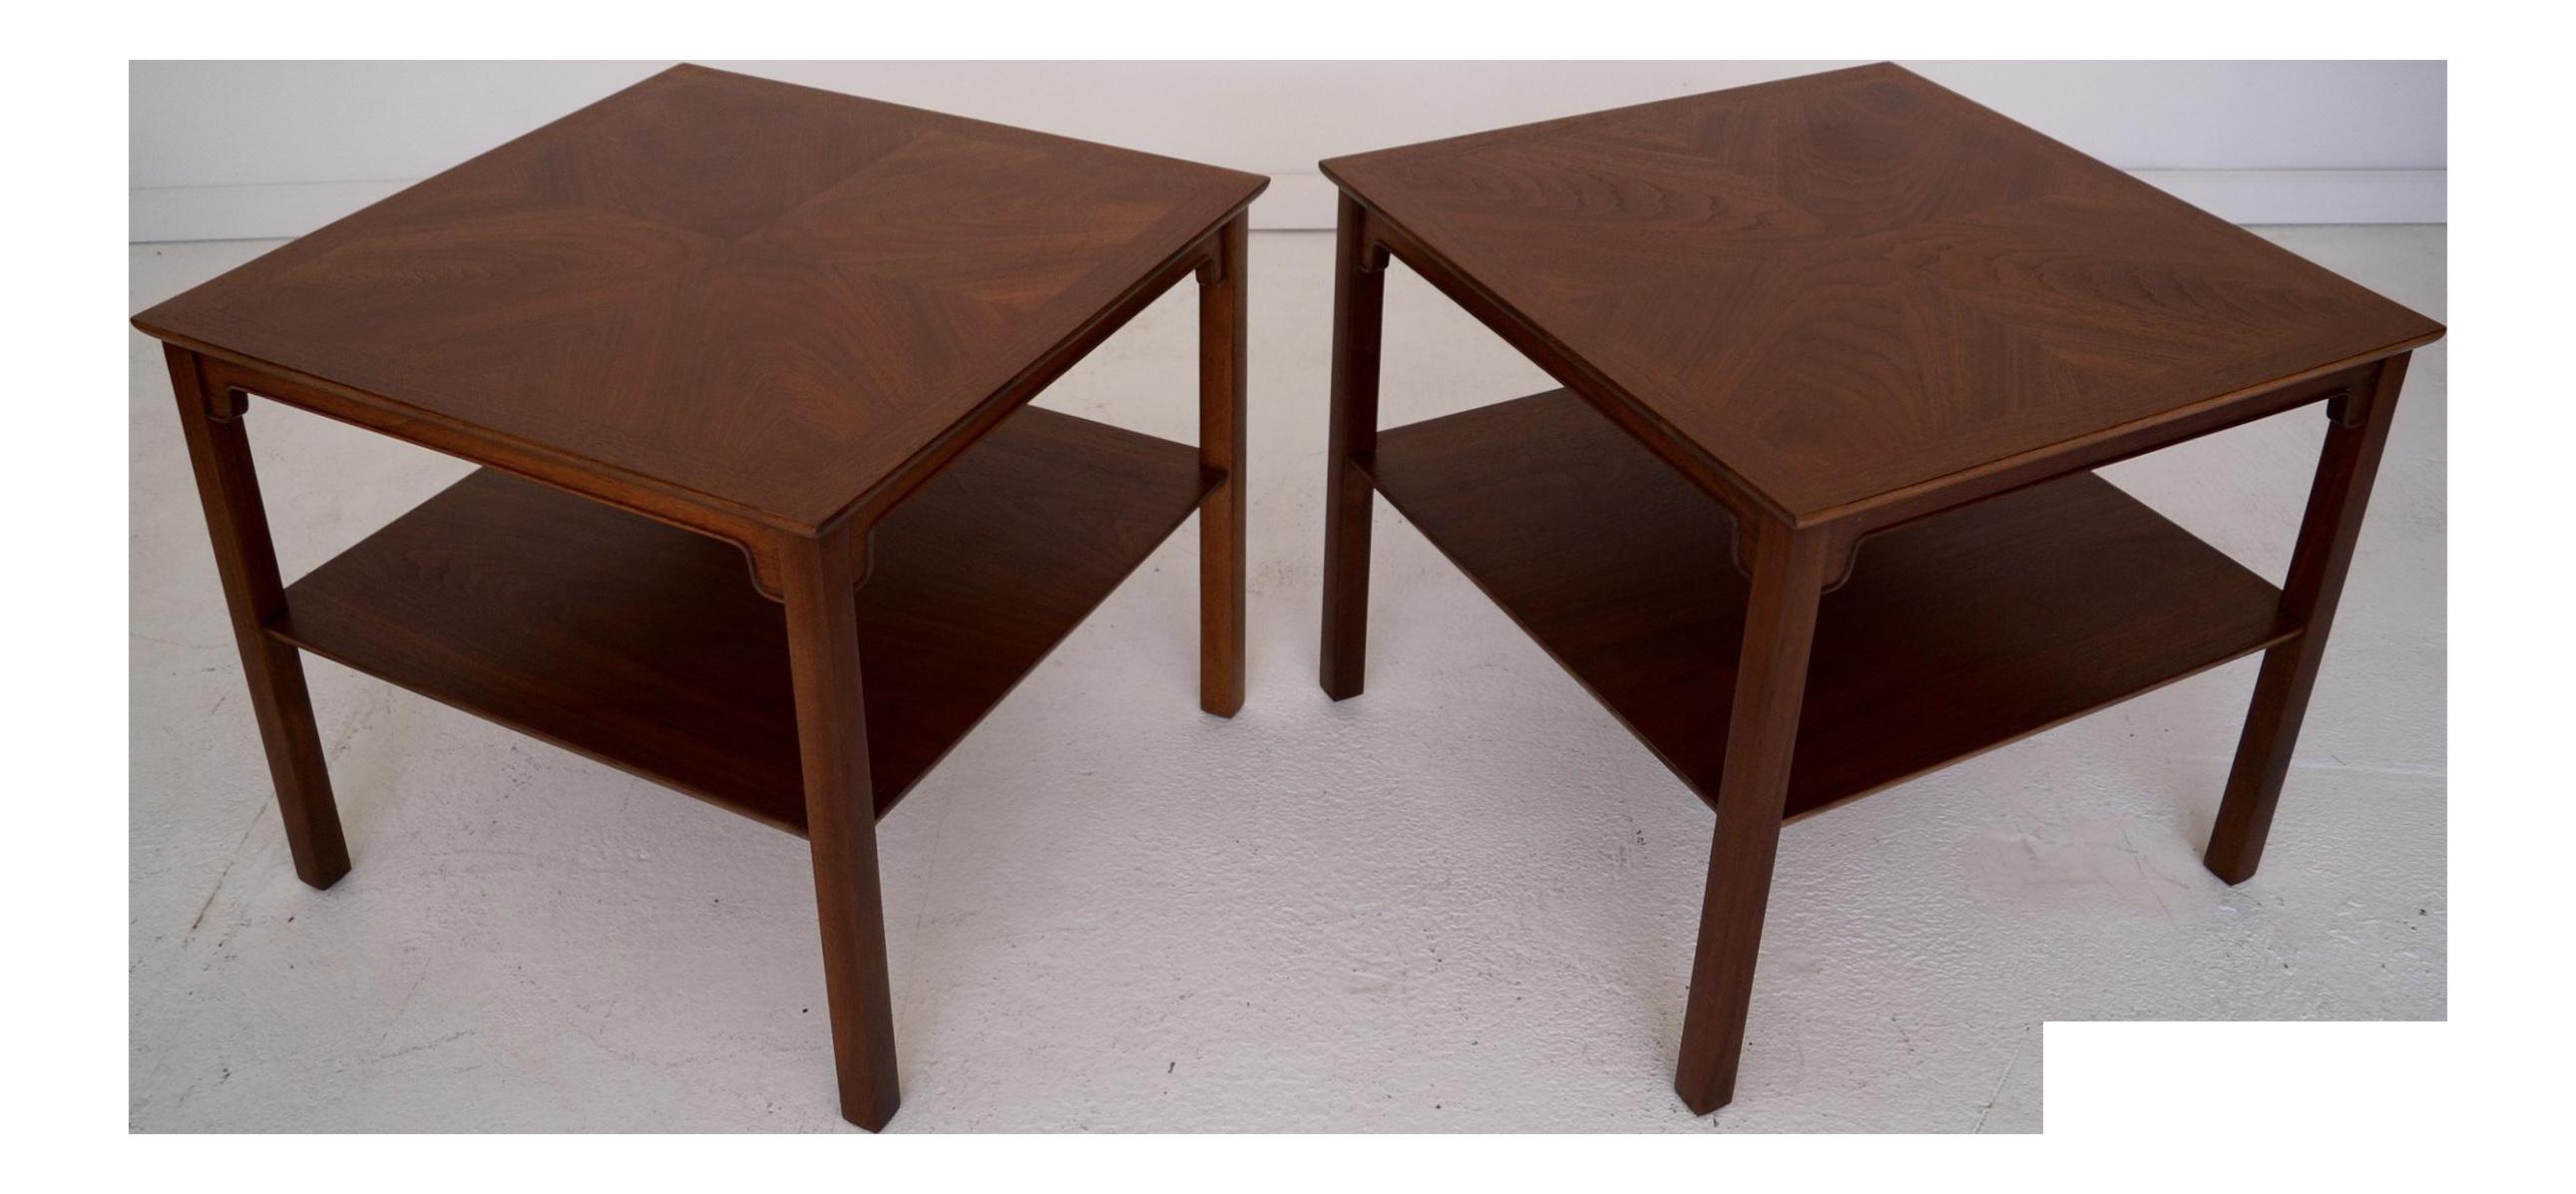 VintageUsed Henredon Furniture DecorArt